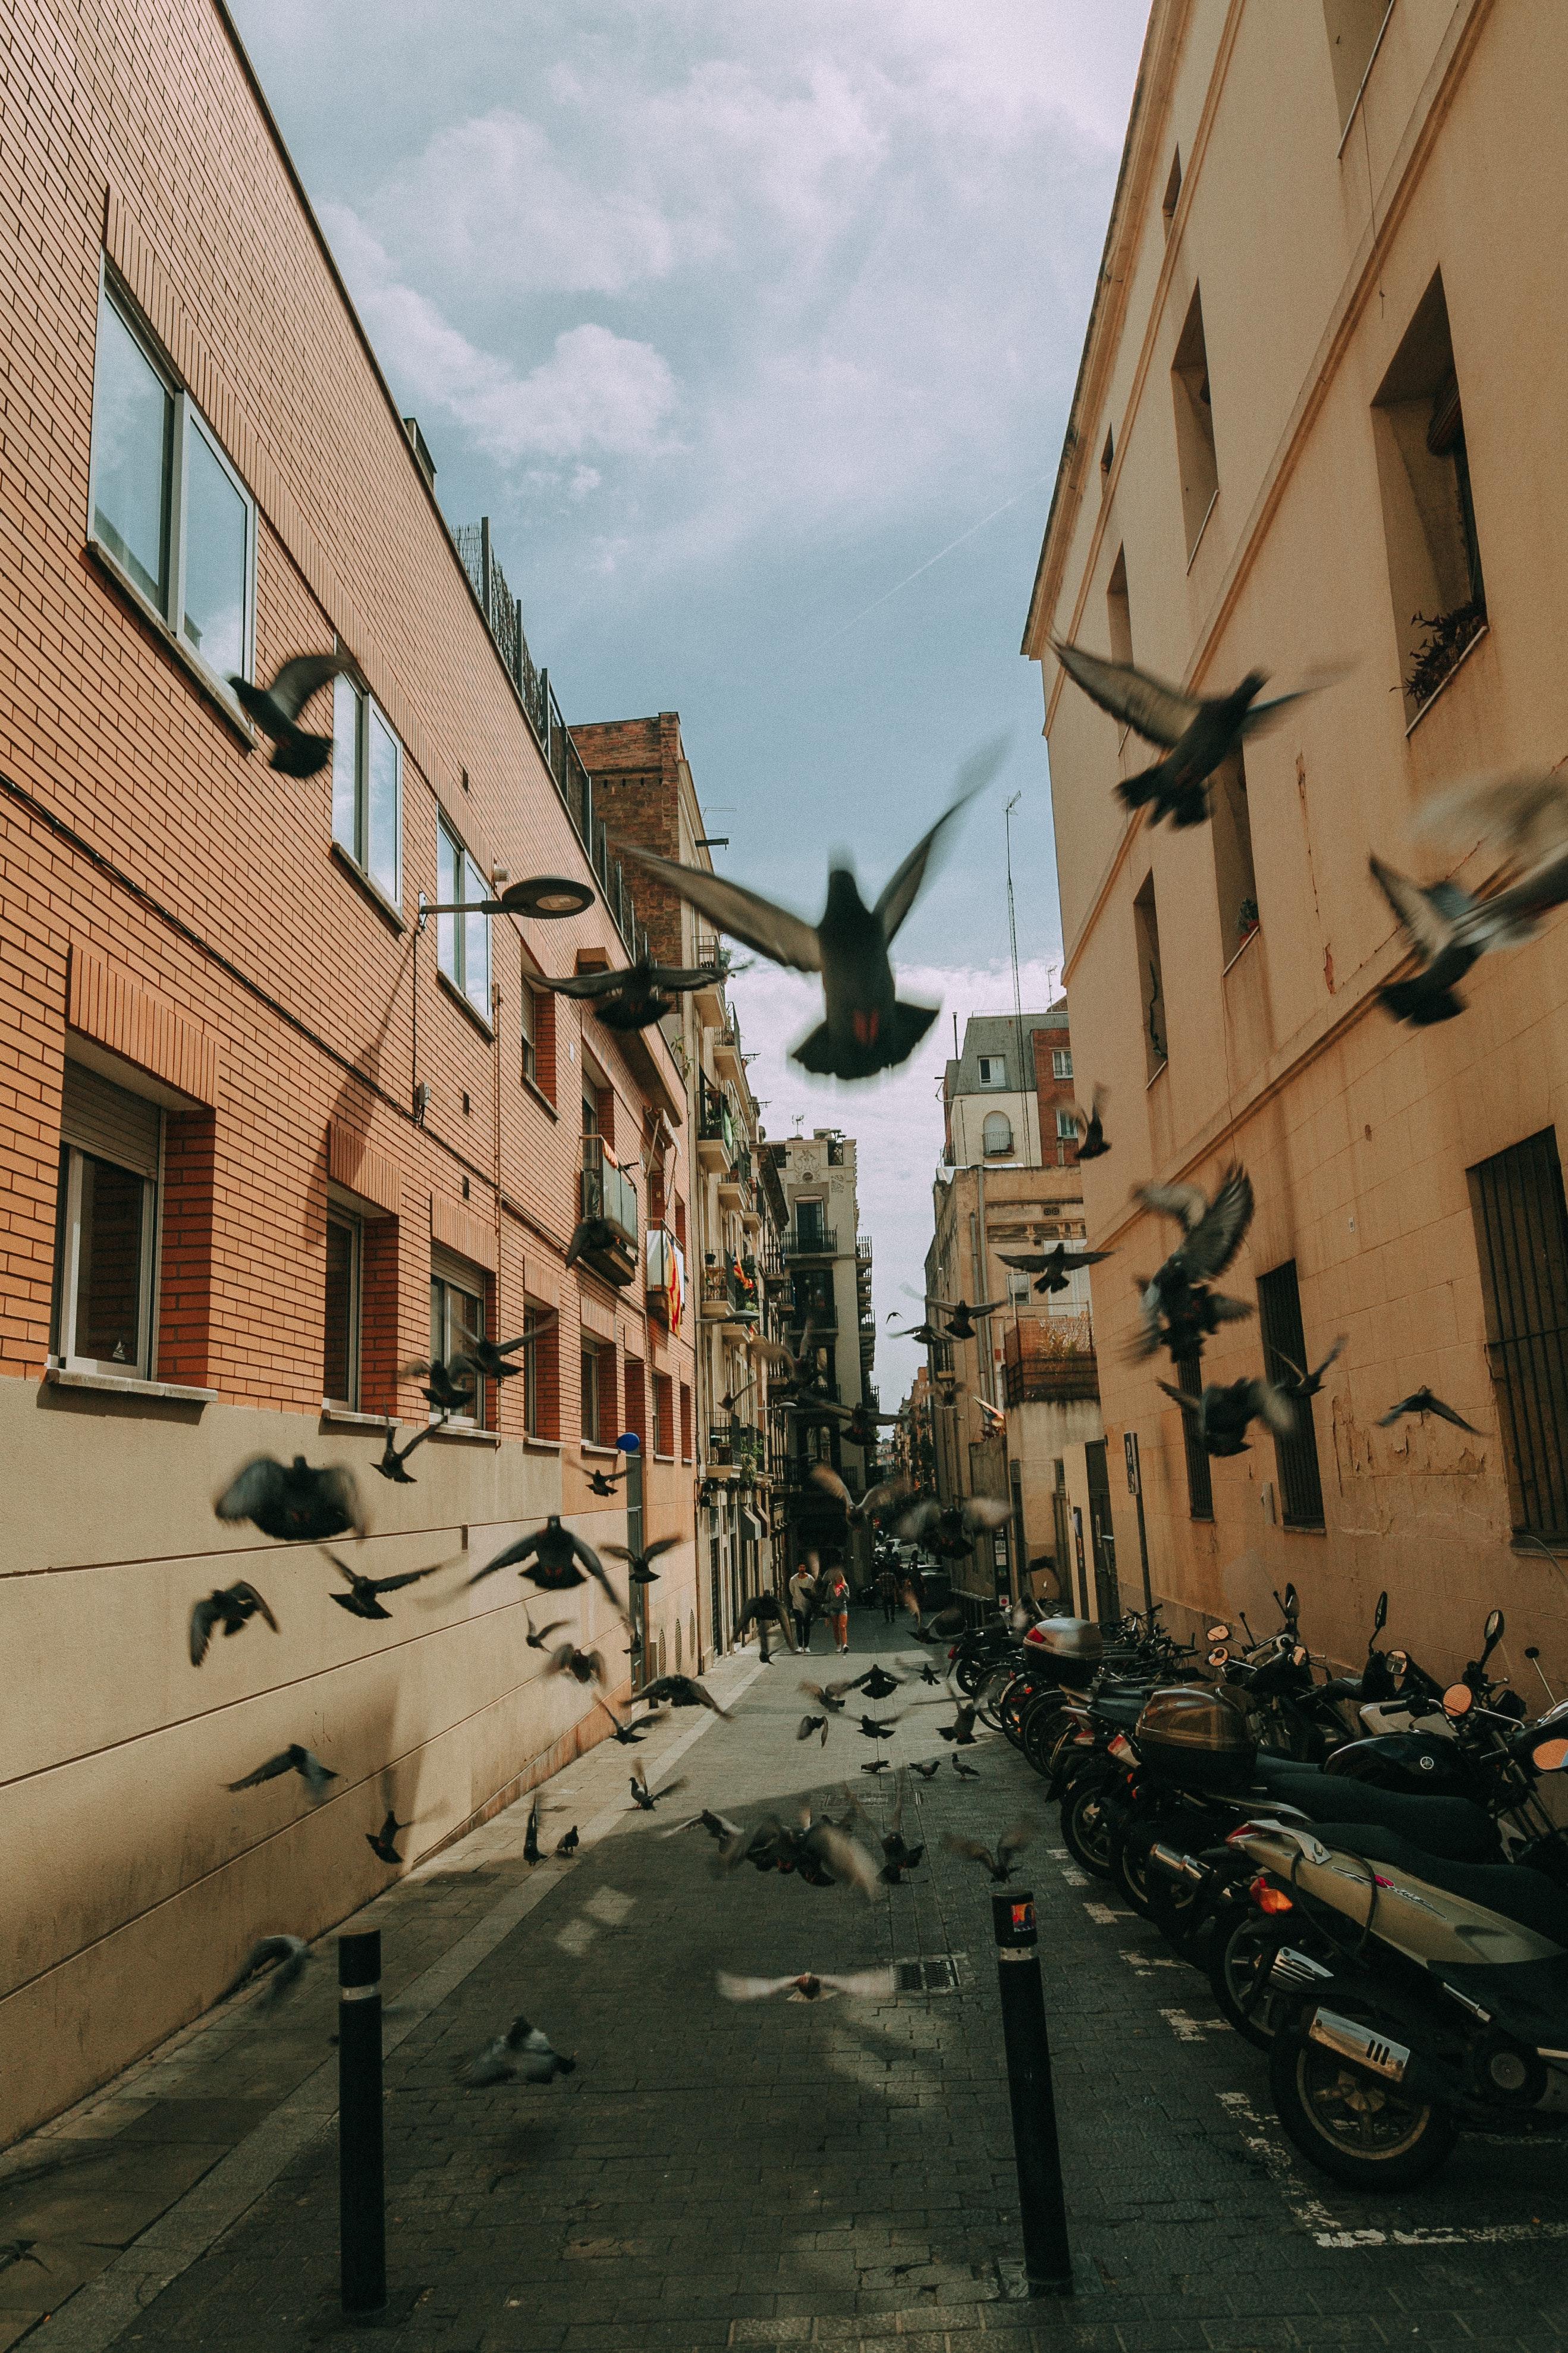 Flock of pigeon photo